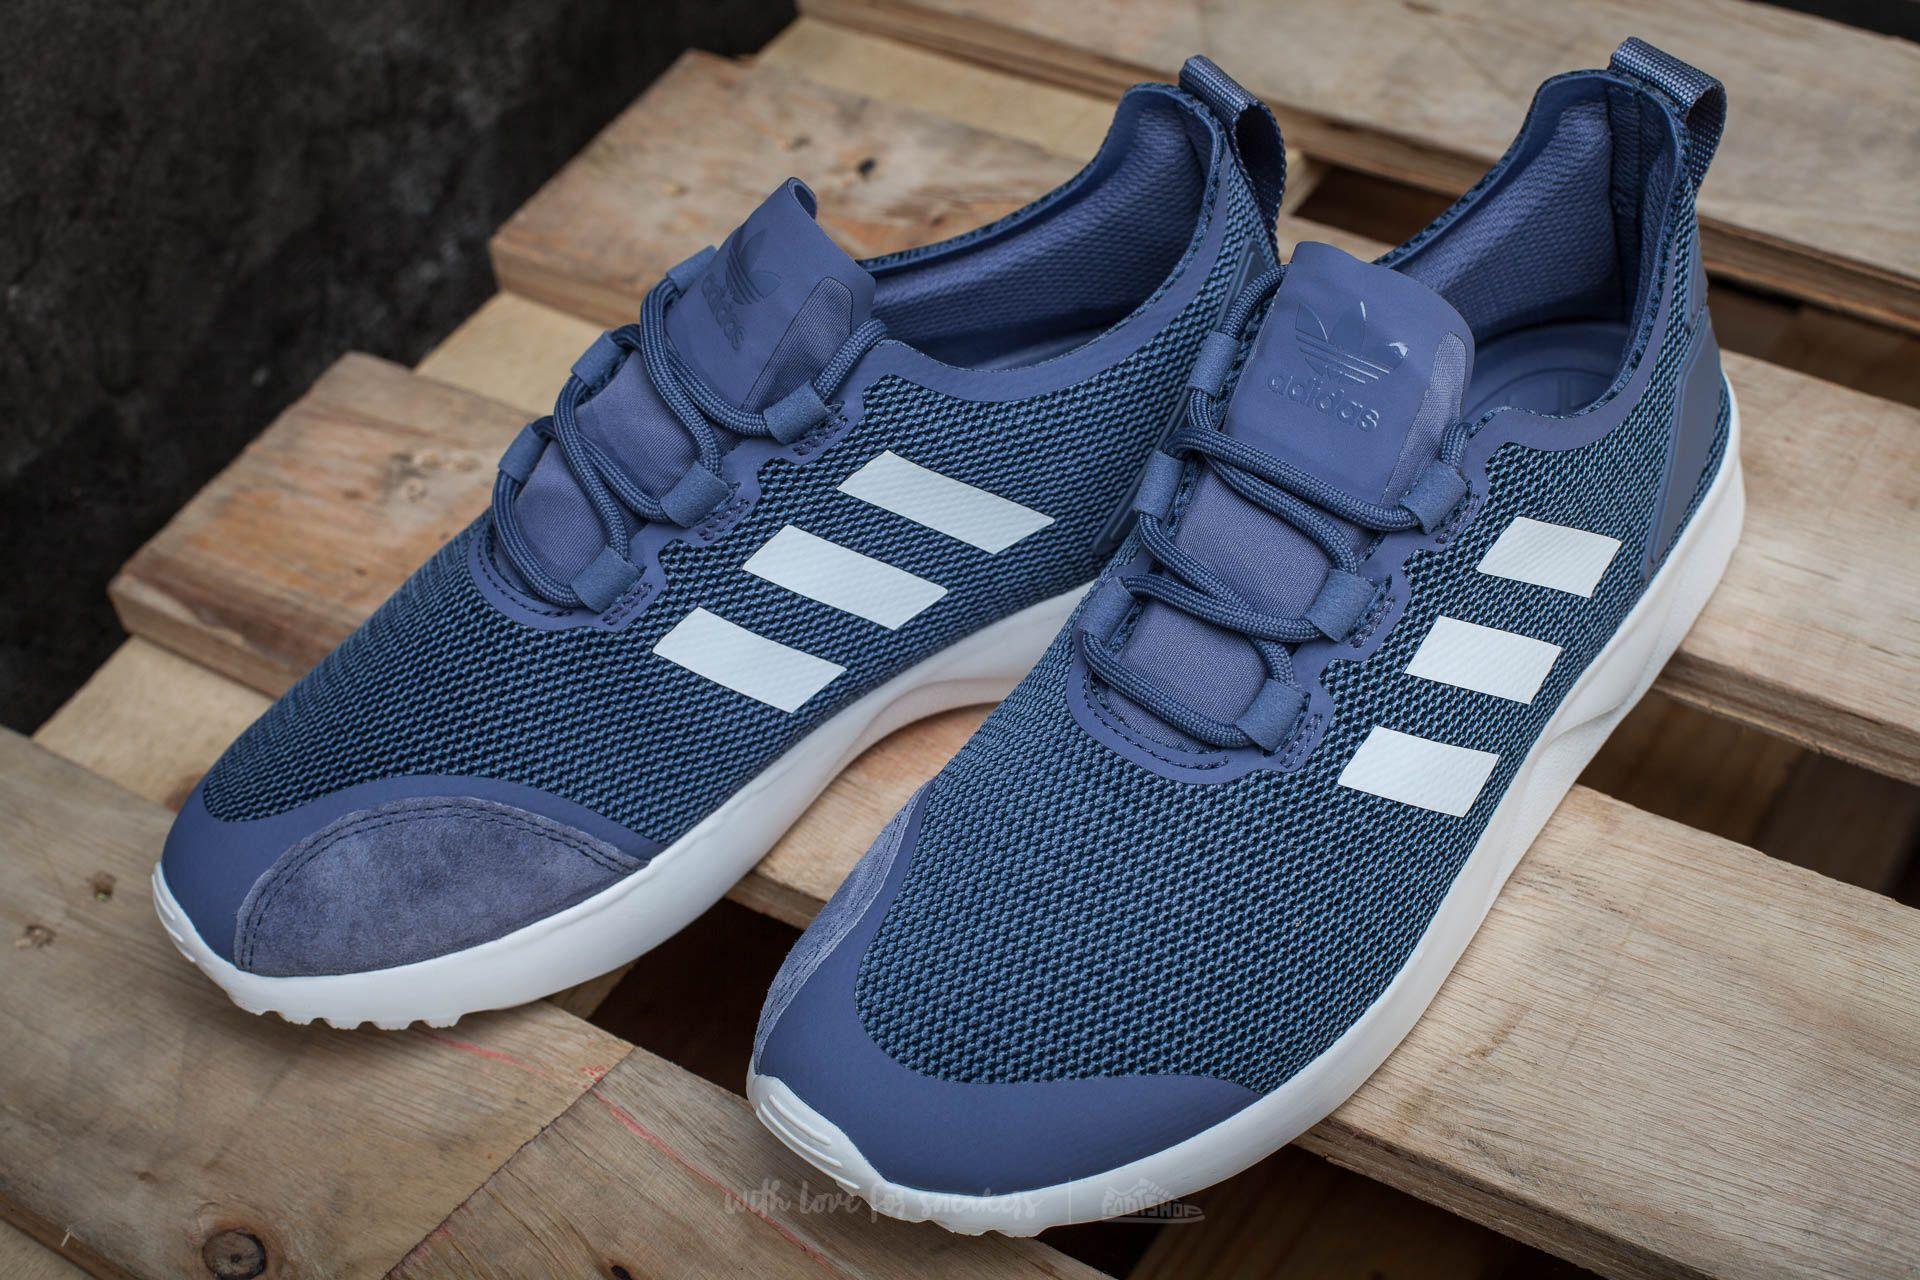 uk adidas zx flux blue purple 653e5 116cb